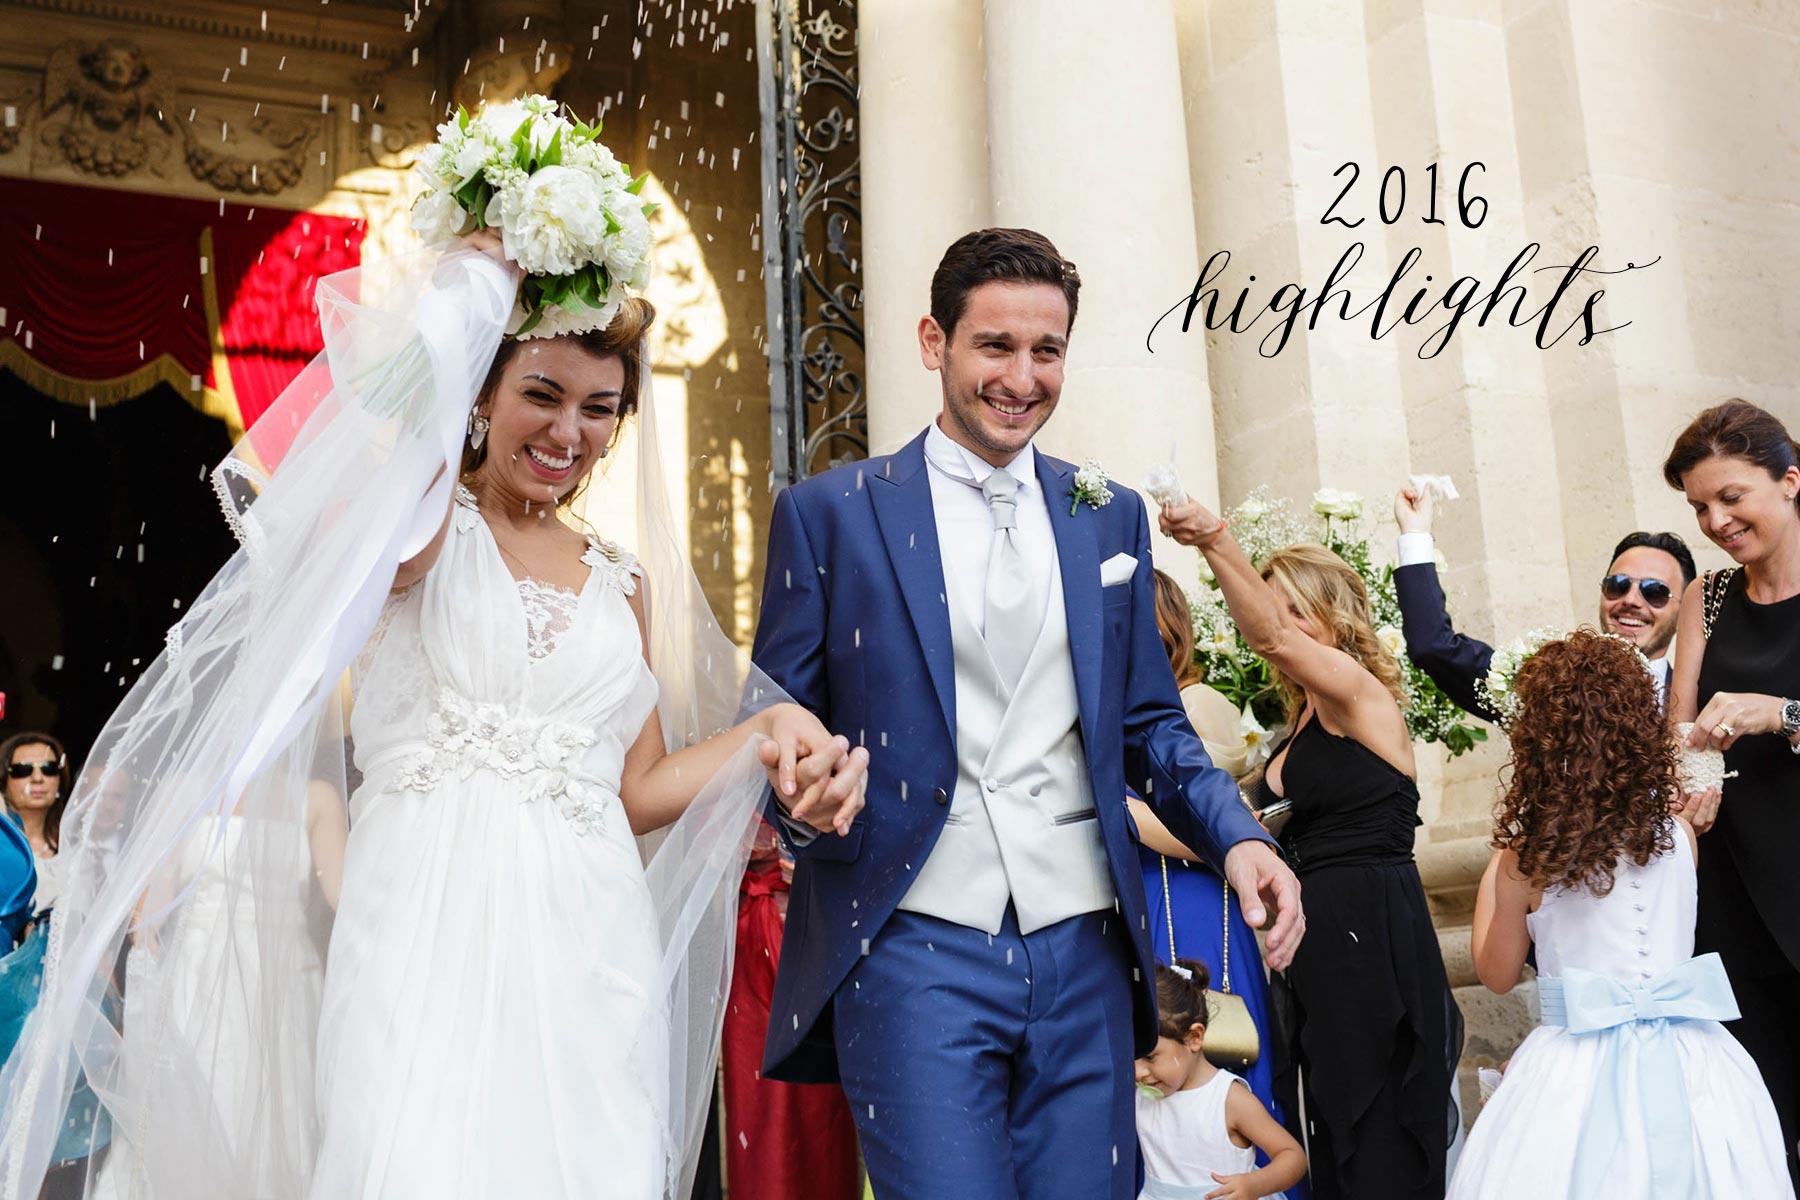 joeewong_sicily-italy-wedding-2016-3